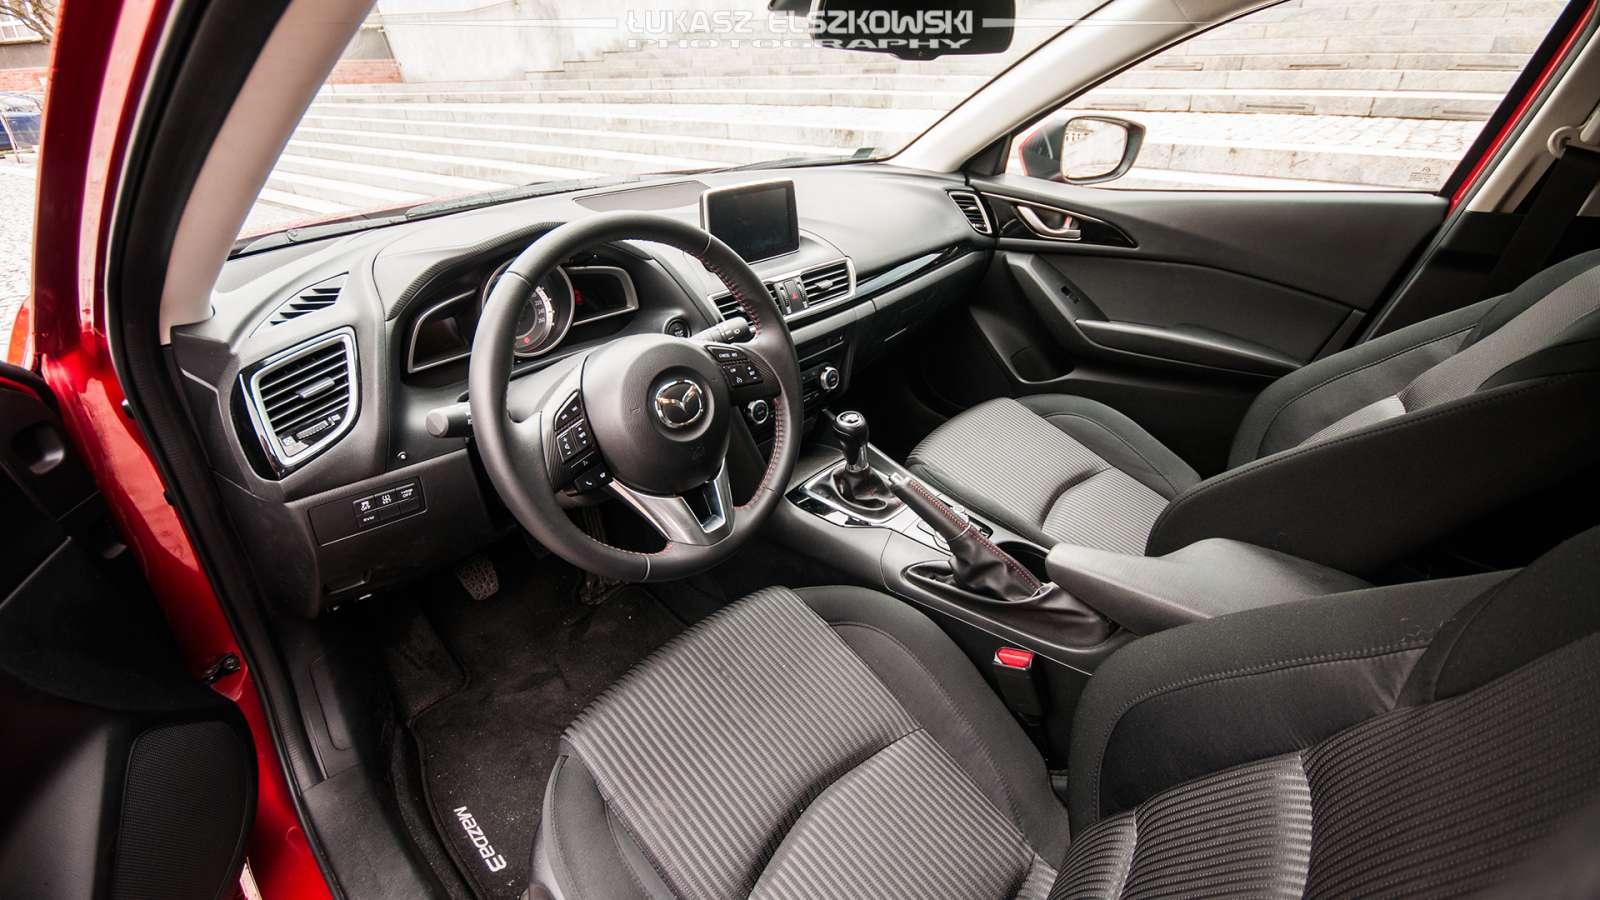 Mazda 3 2.0 SkyActiv-G interior